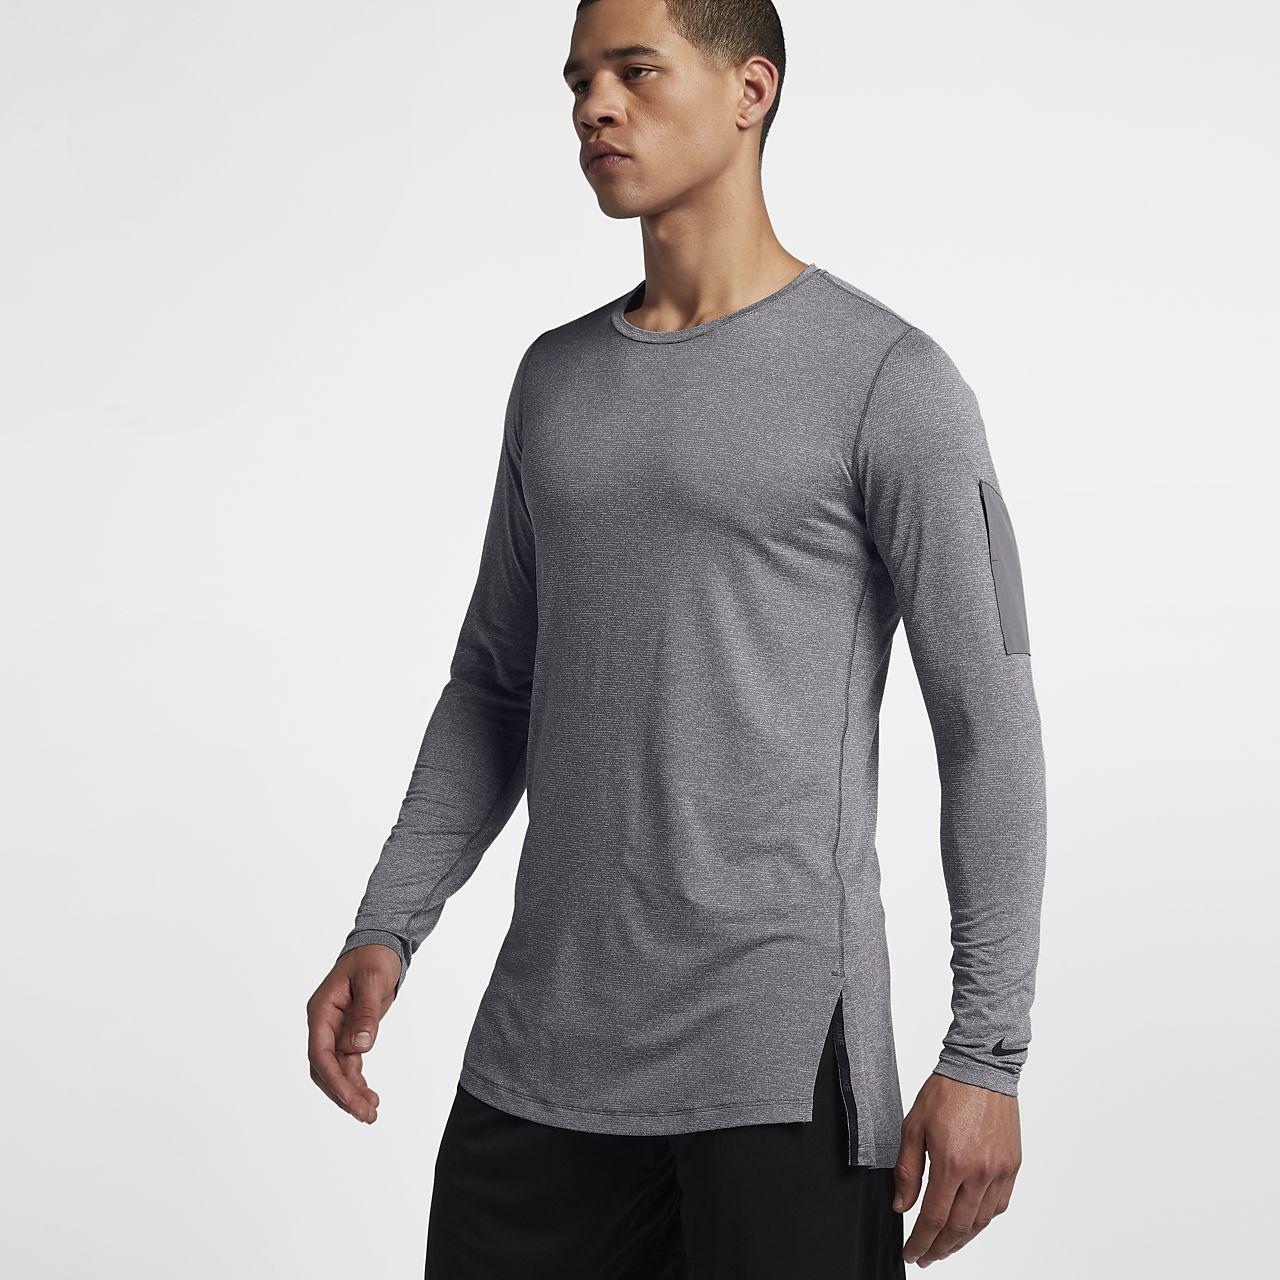 Nike Dri-FIT Men s Utility Long-Sleeve Training Top. Nike.com GB 2a5b9d486